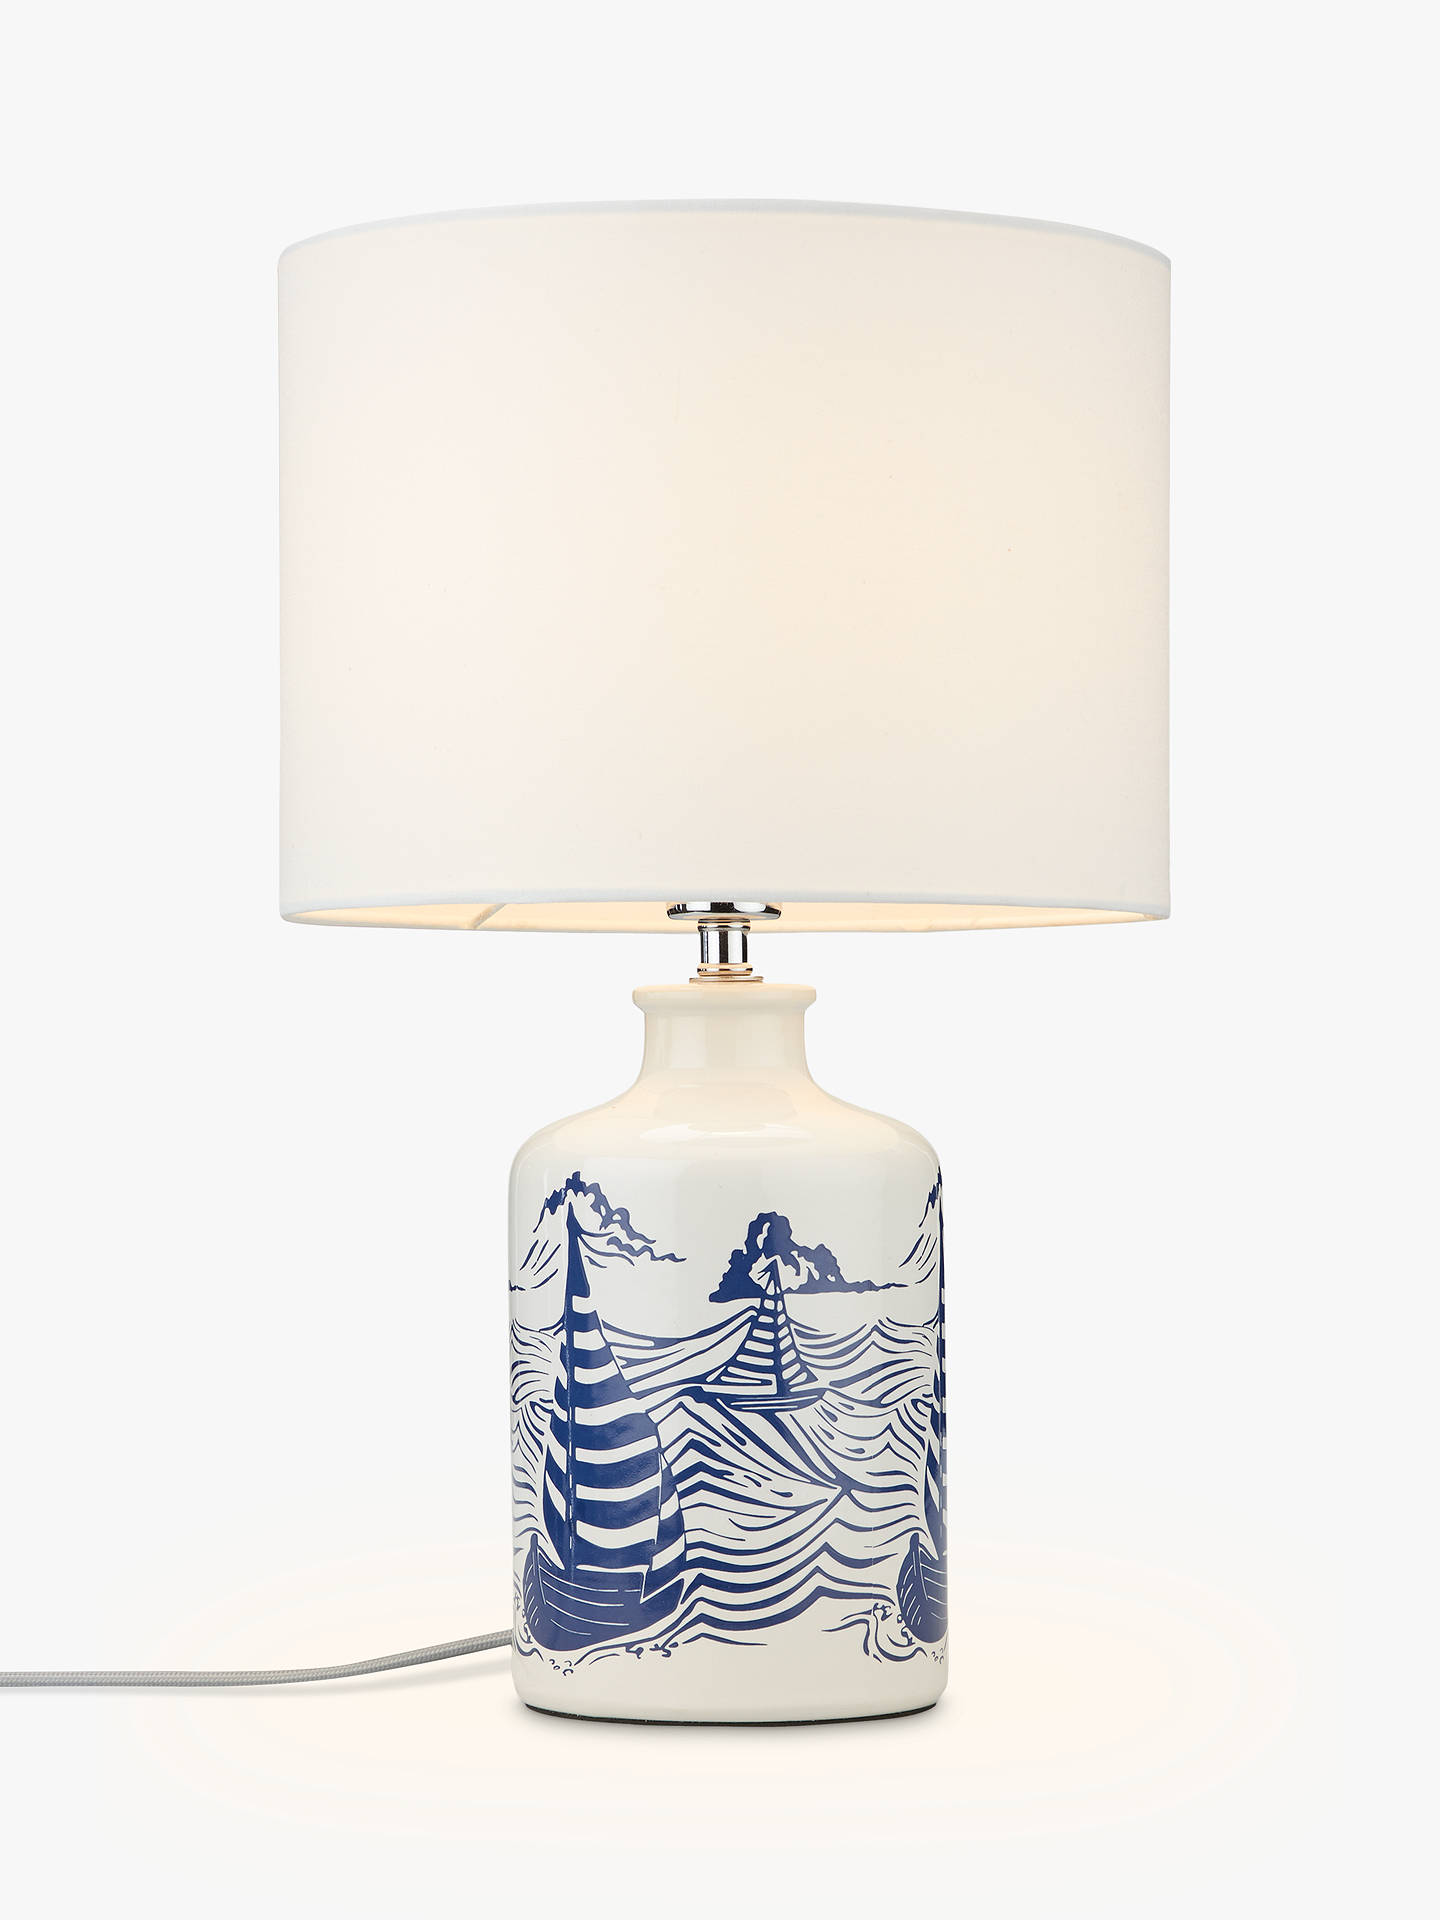 John lewis salcombe boats ceramic table lamp white at john lewis buyjohn lewis salcombe boats ceramic table lamp white online at johnlewis aloadofball Choice Image